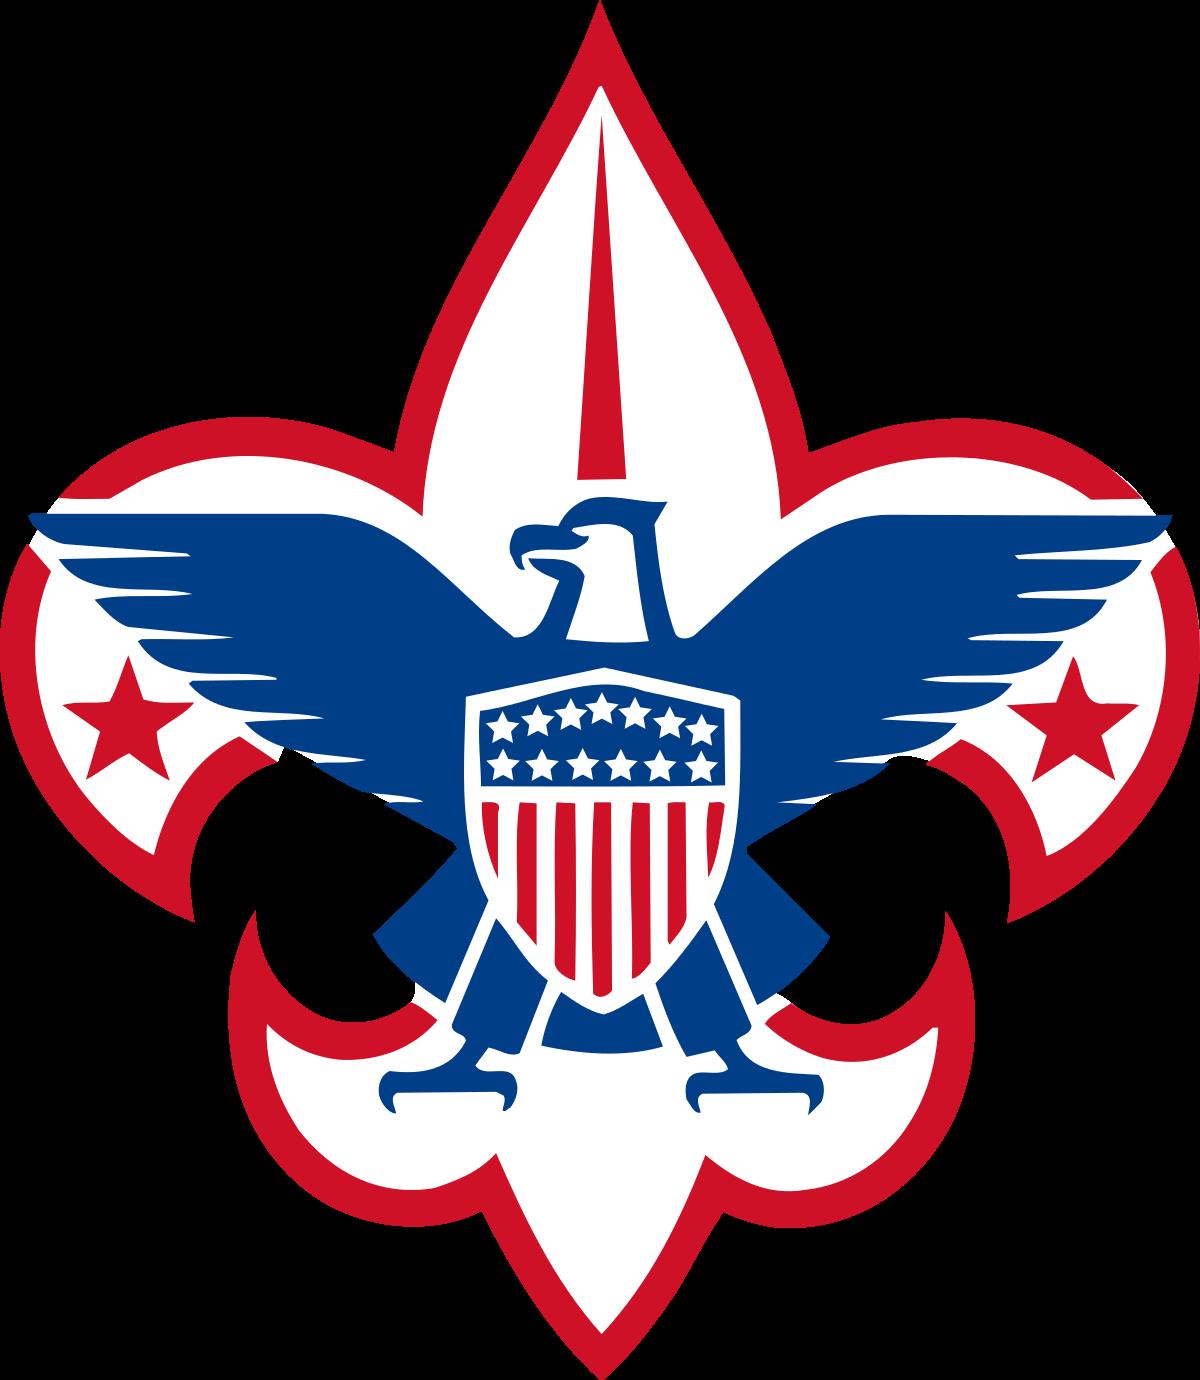 f6d6c7bd95f8 Boy Scouts of America - Wikipedia